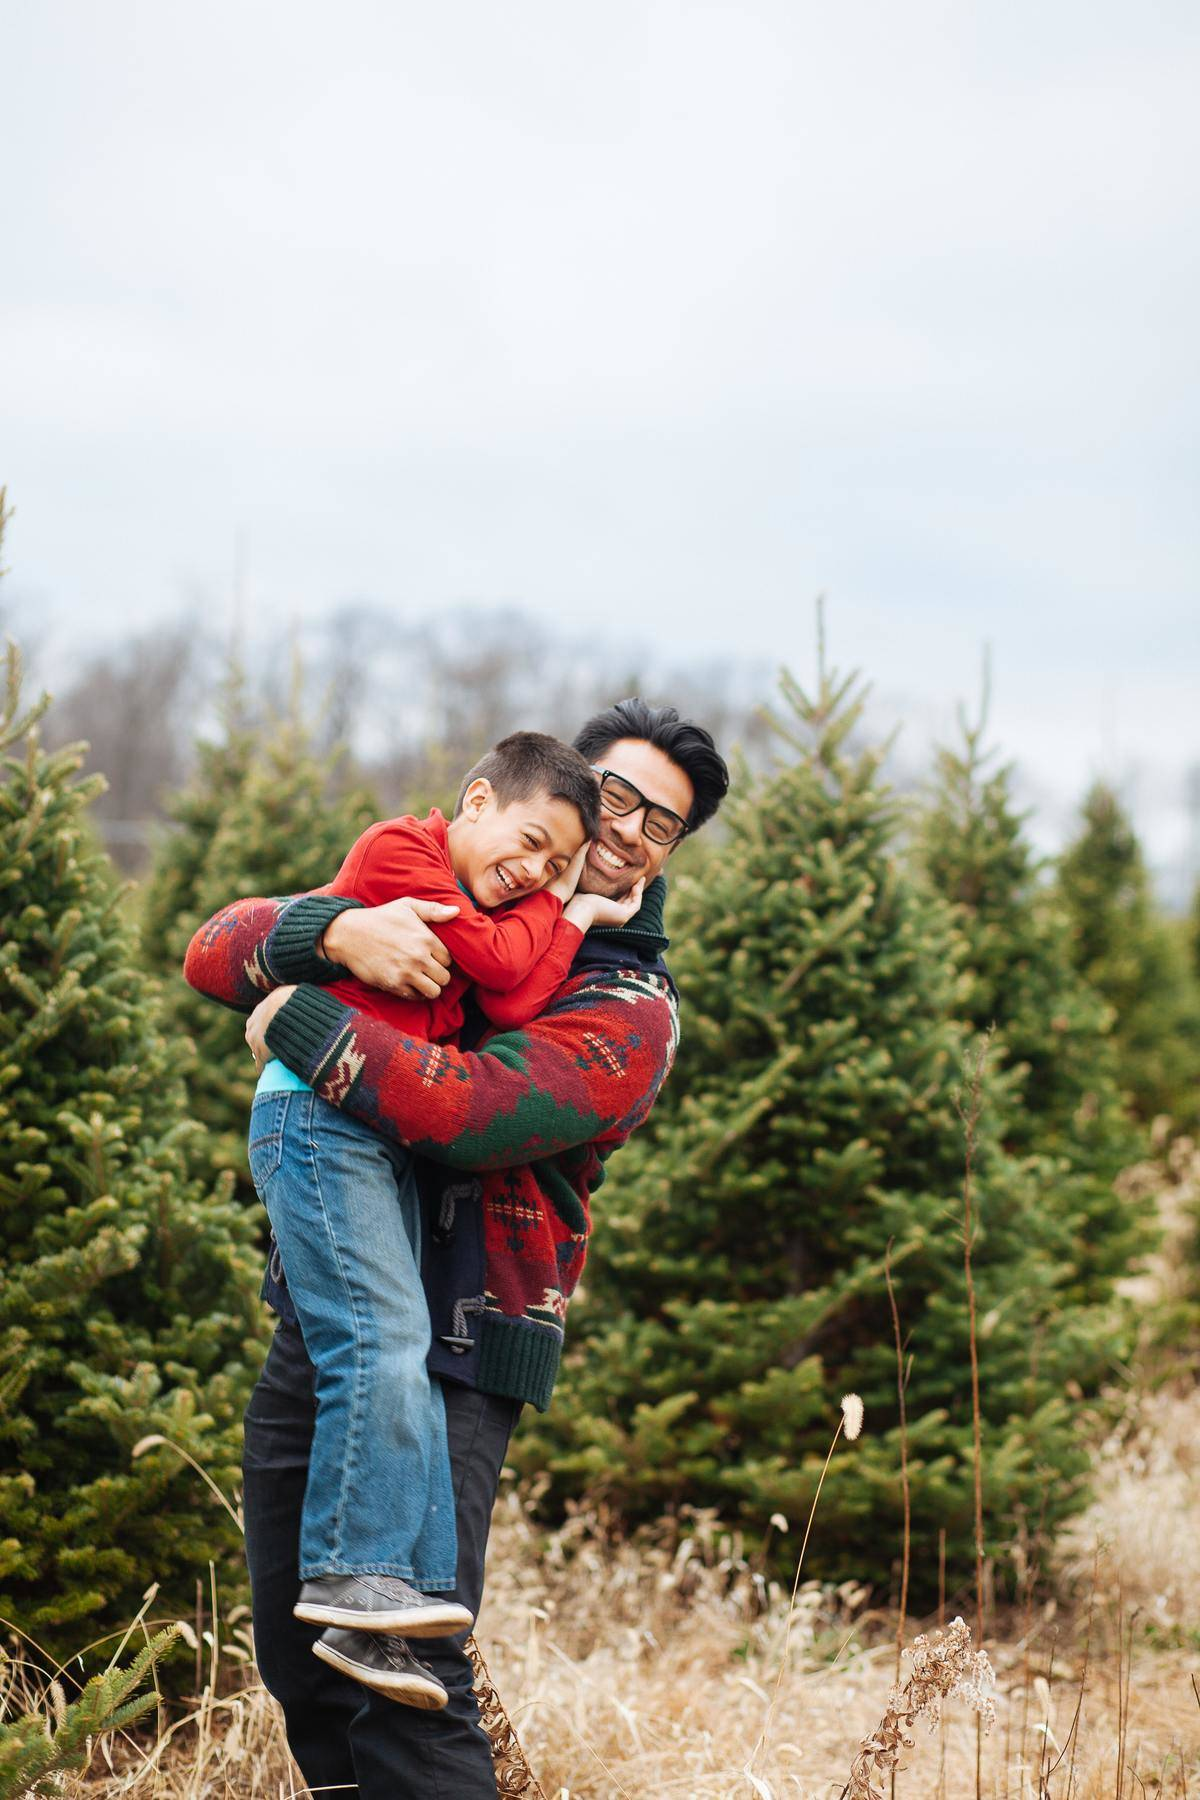 dad hugging his son, both smiling